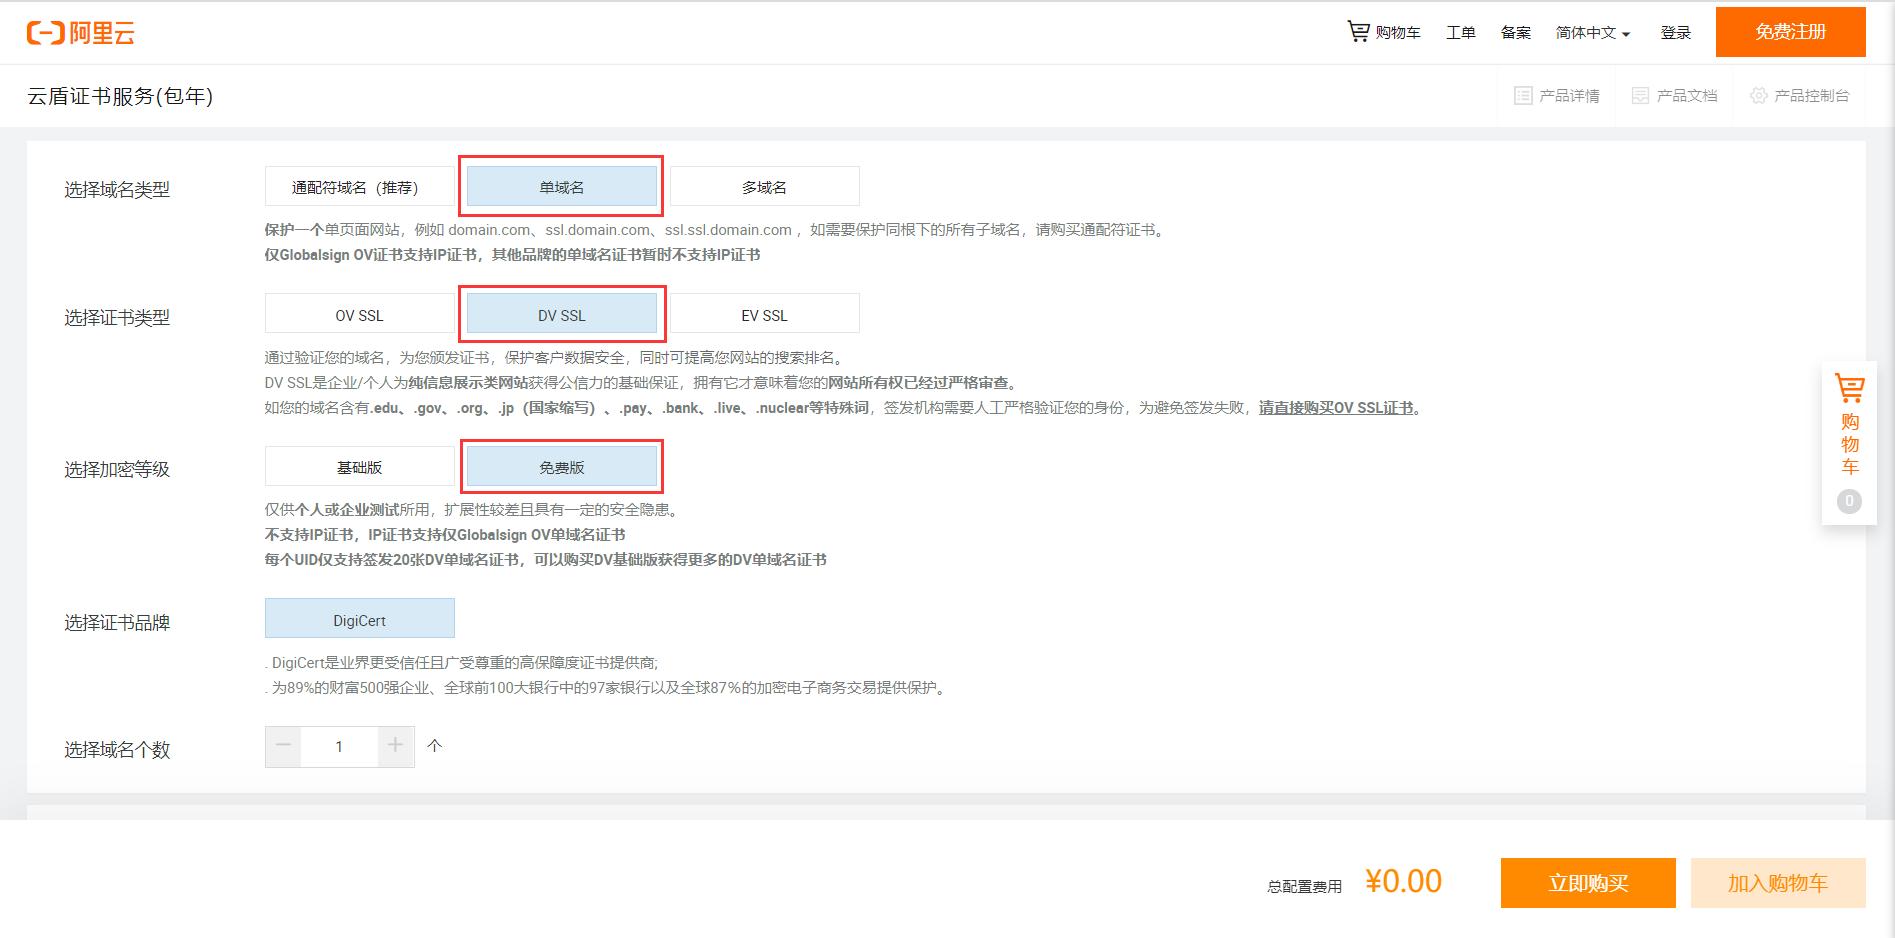 ModSecurity通过SecRemoteRules指令加载远程服务器上的规则